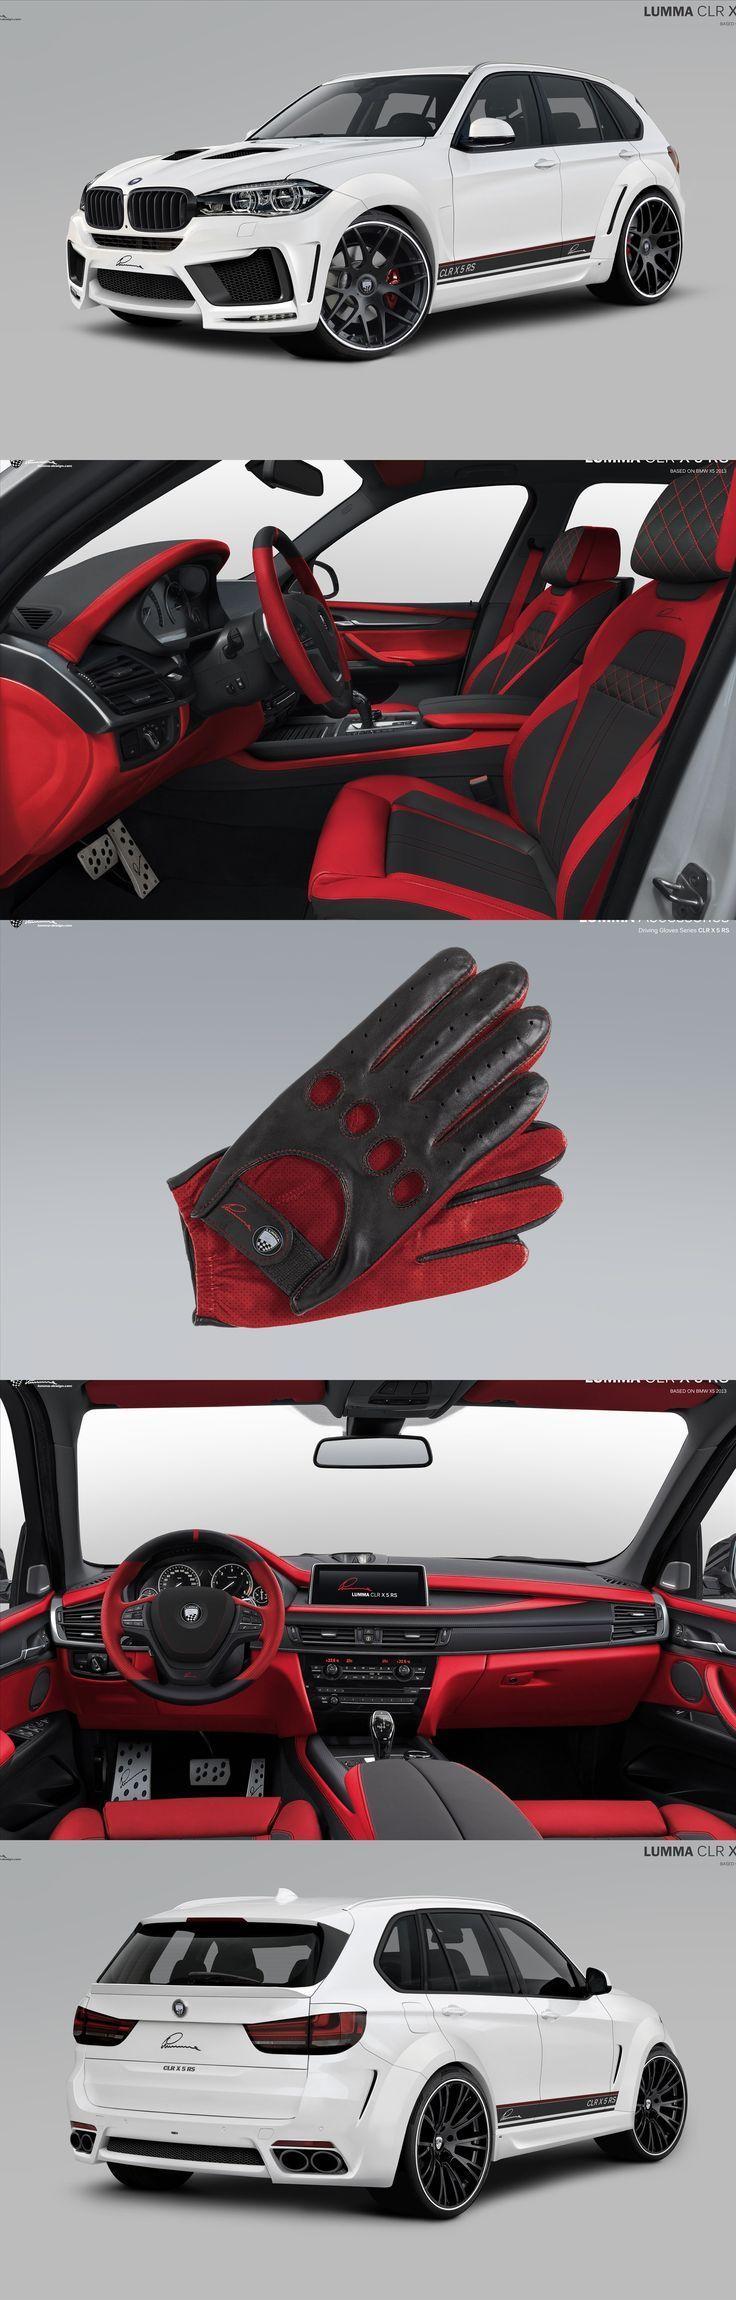 Visit The MACHINE Shop Café... ❤ Best of SUV @ MACHINE... ❤ (2014 Lumma Designed BMW X5 LUMMA CLR X 5 RS SUV)